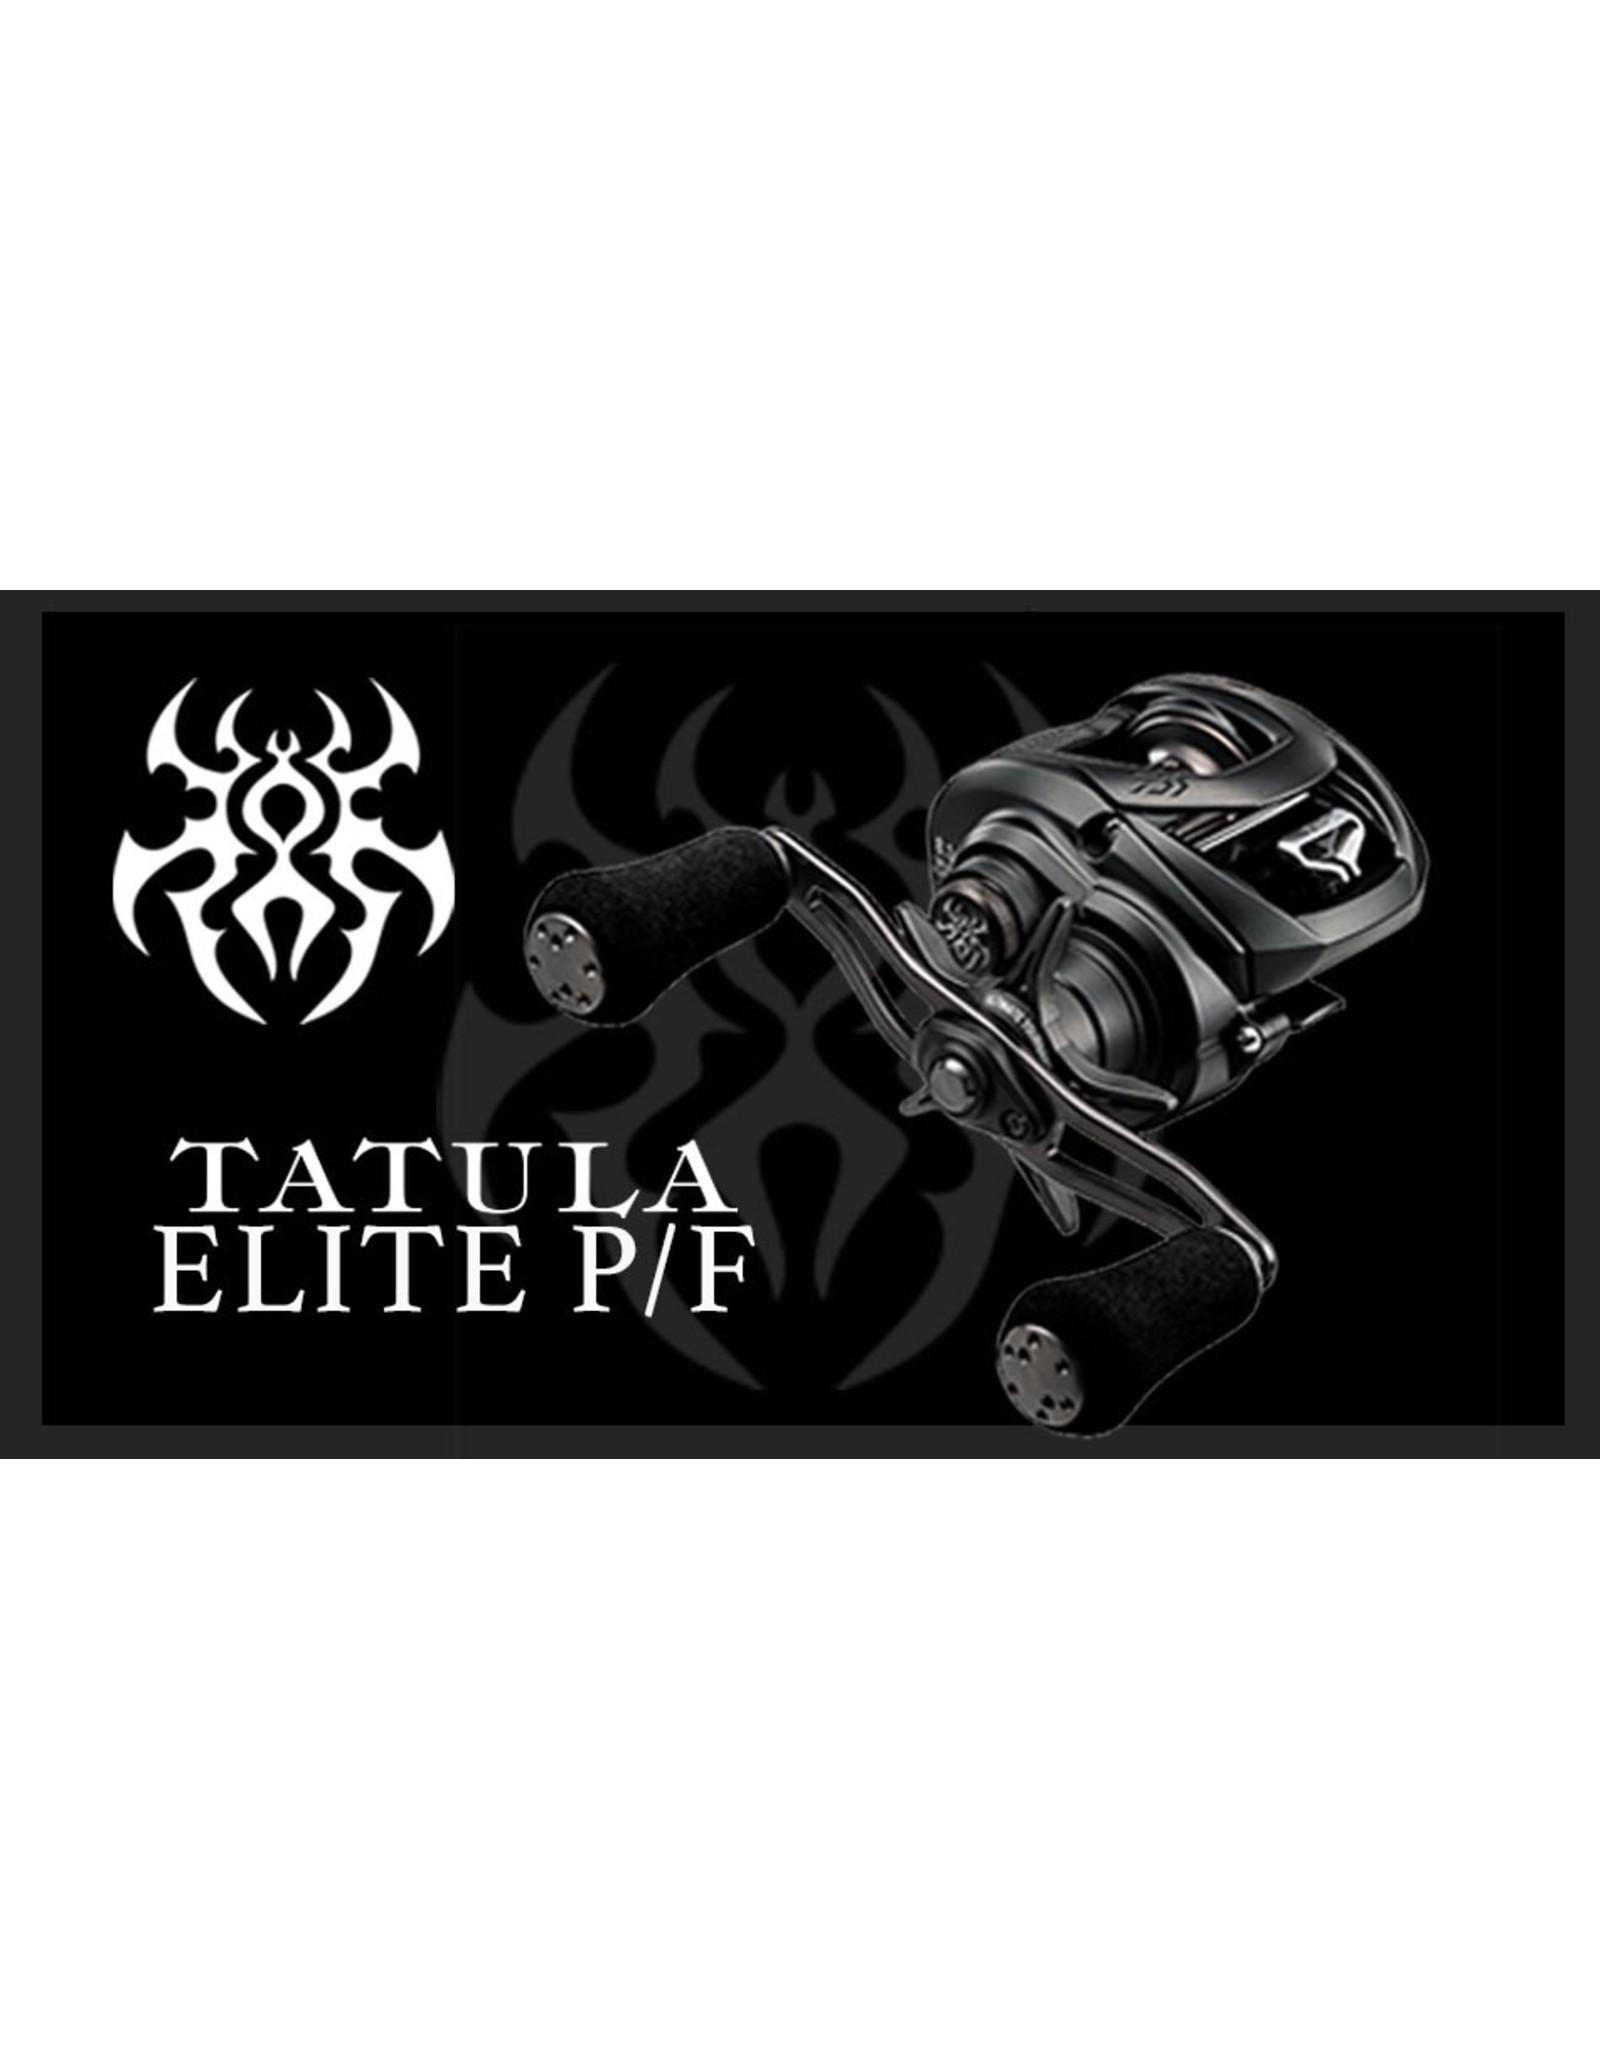 Daiwa Daiwa Tatula Elite Pitching/Flipping Casting Reel